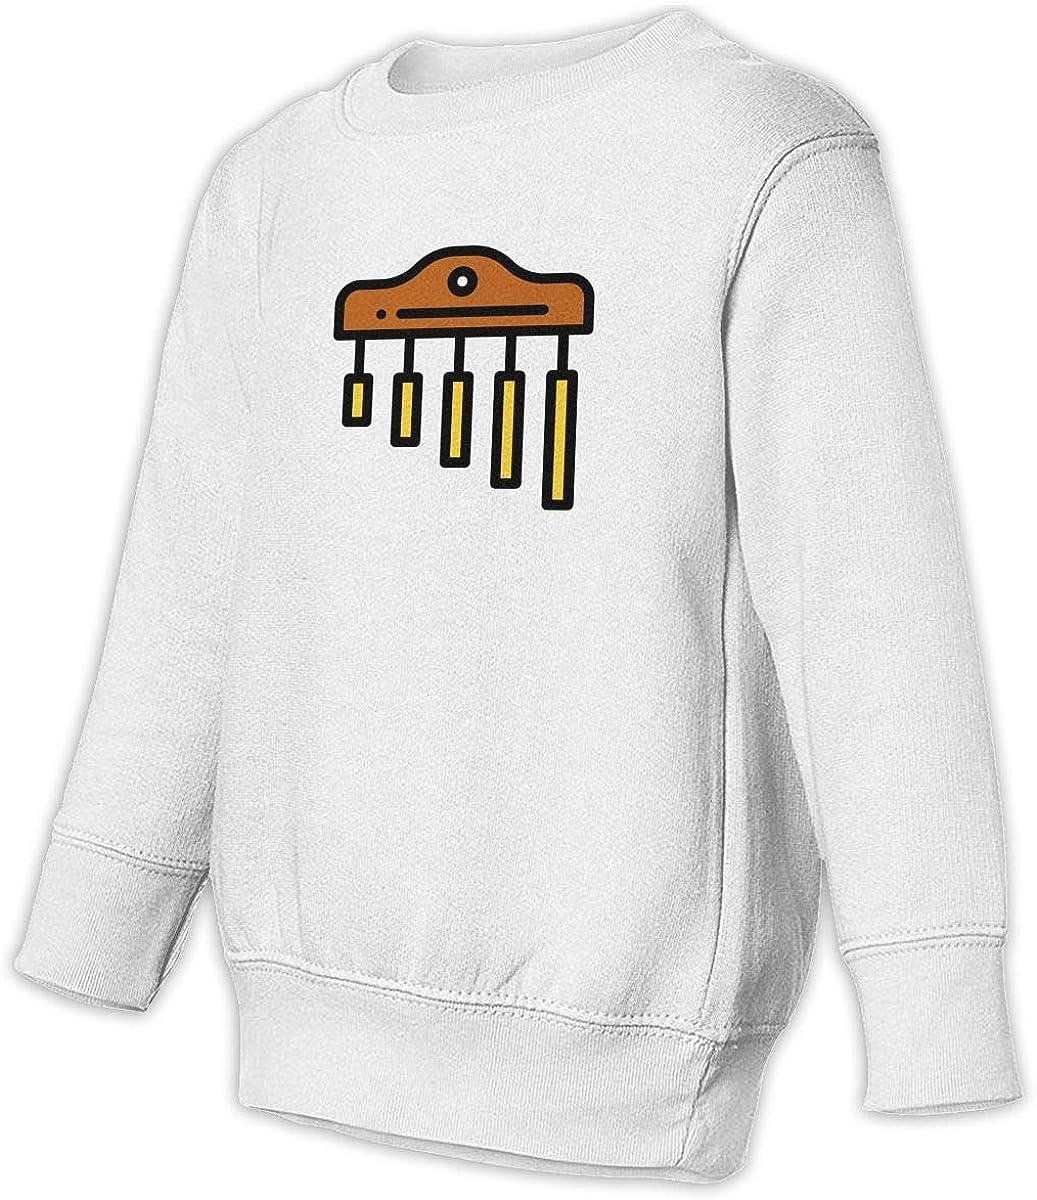 Chimes Unisex Toddler Hoodies Fleece Pull Over Sweatshirt for Boys Girls Kids Youth